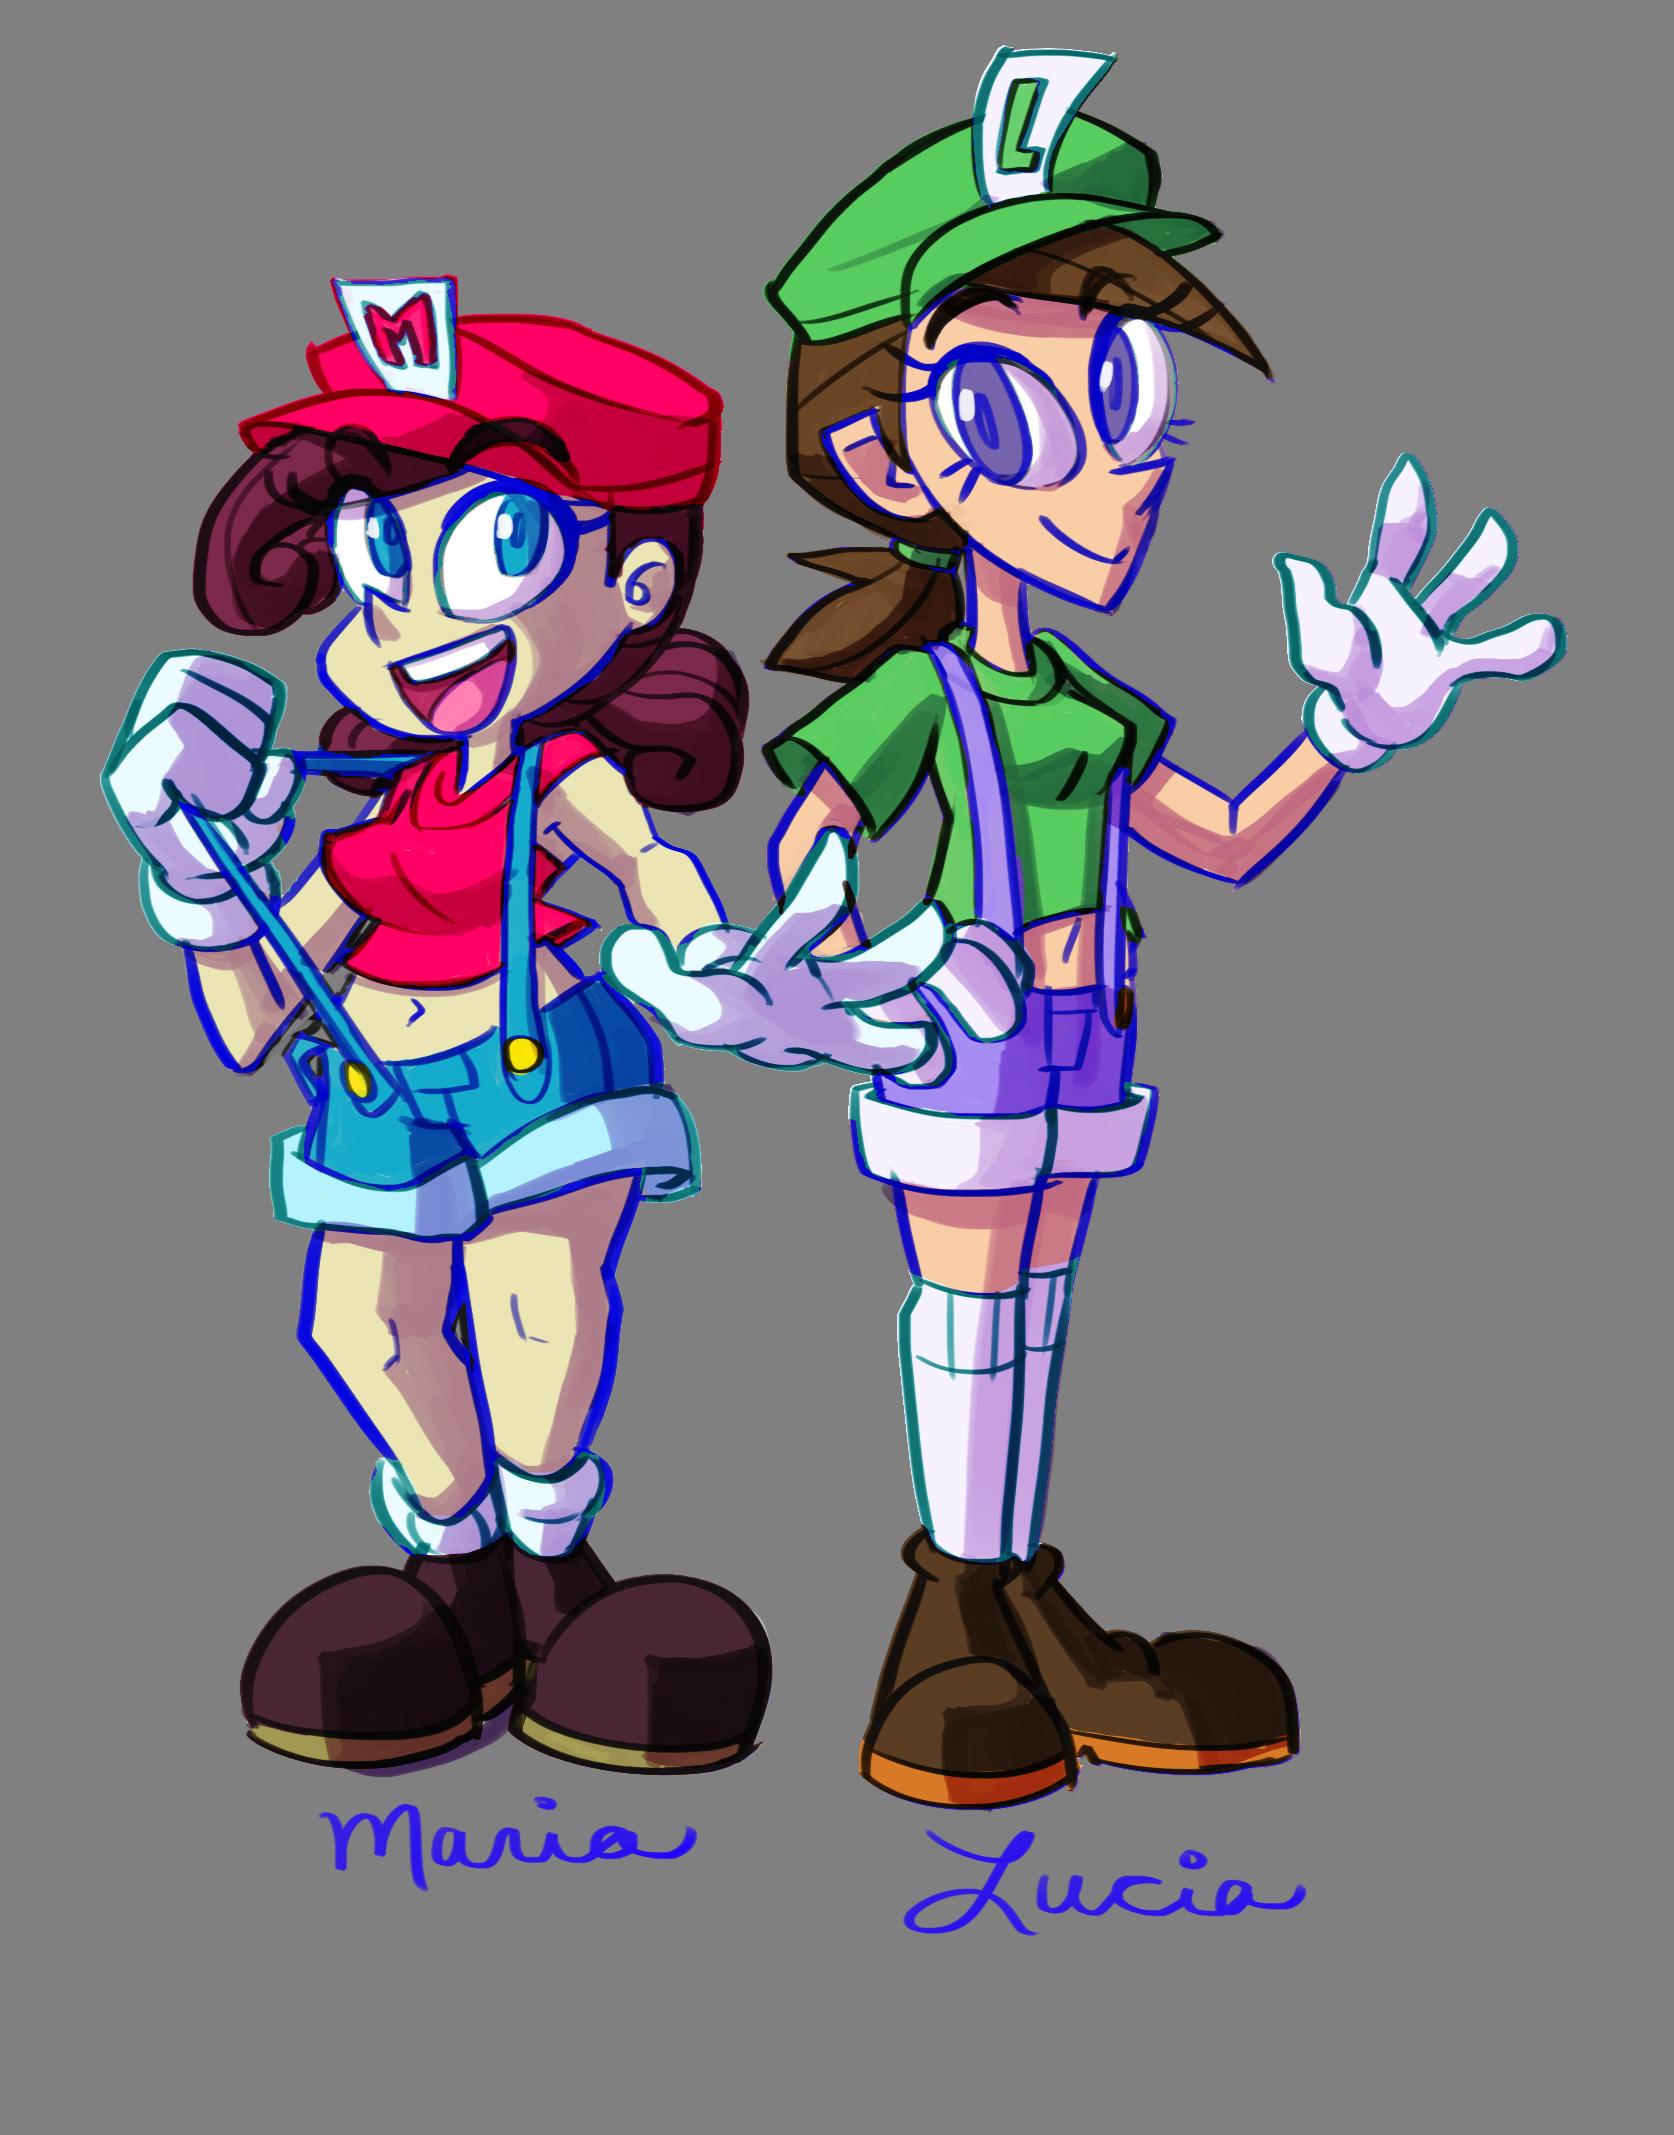 The Super Maria Sisters